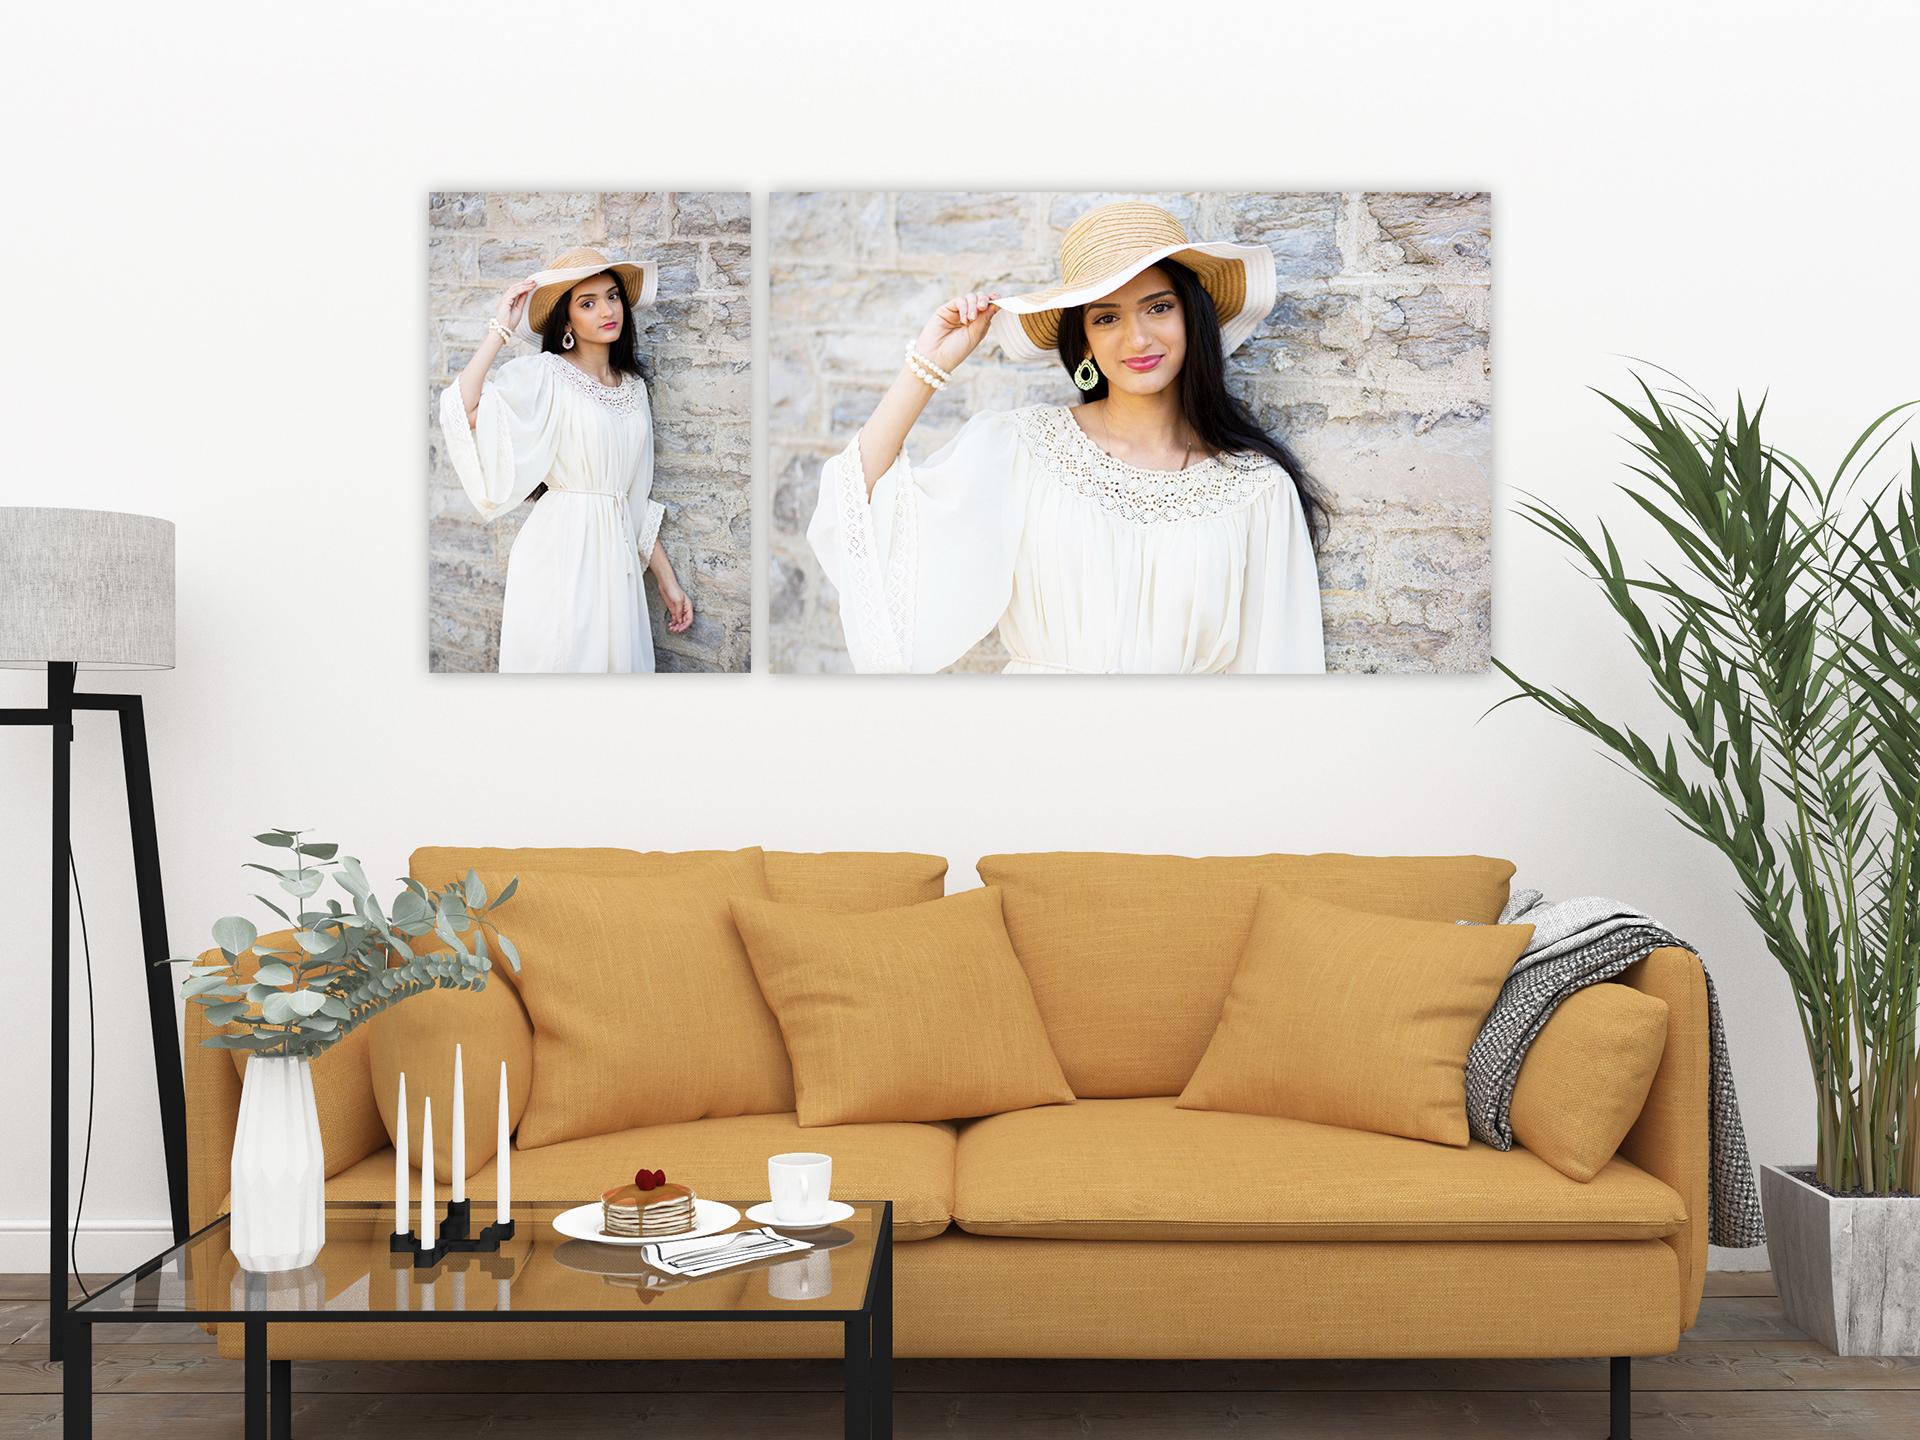 Wall Canvas.jpg